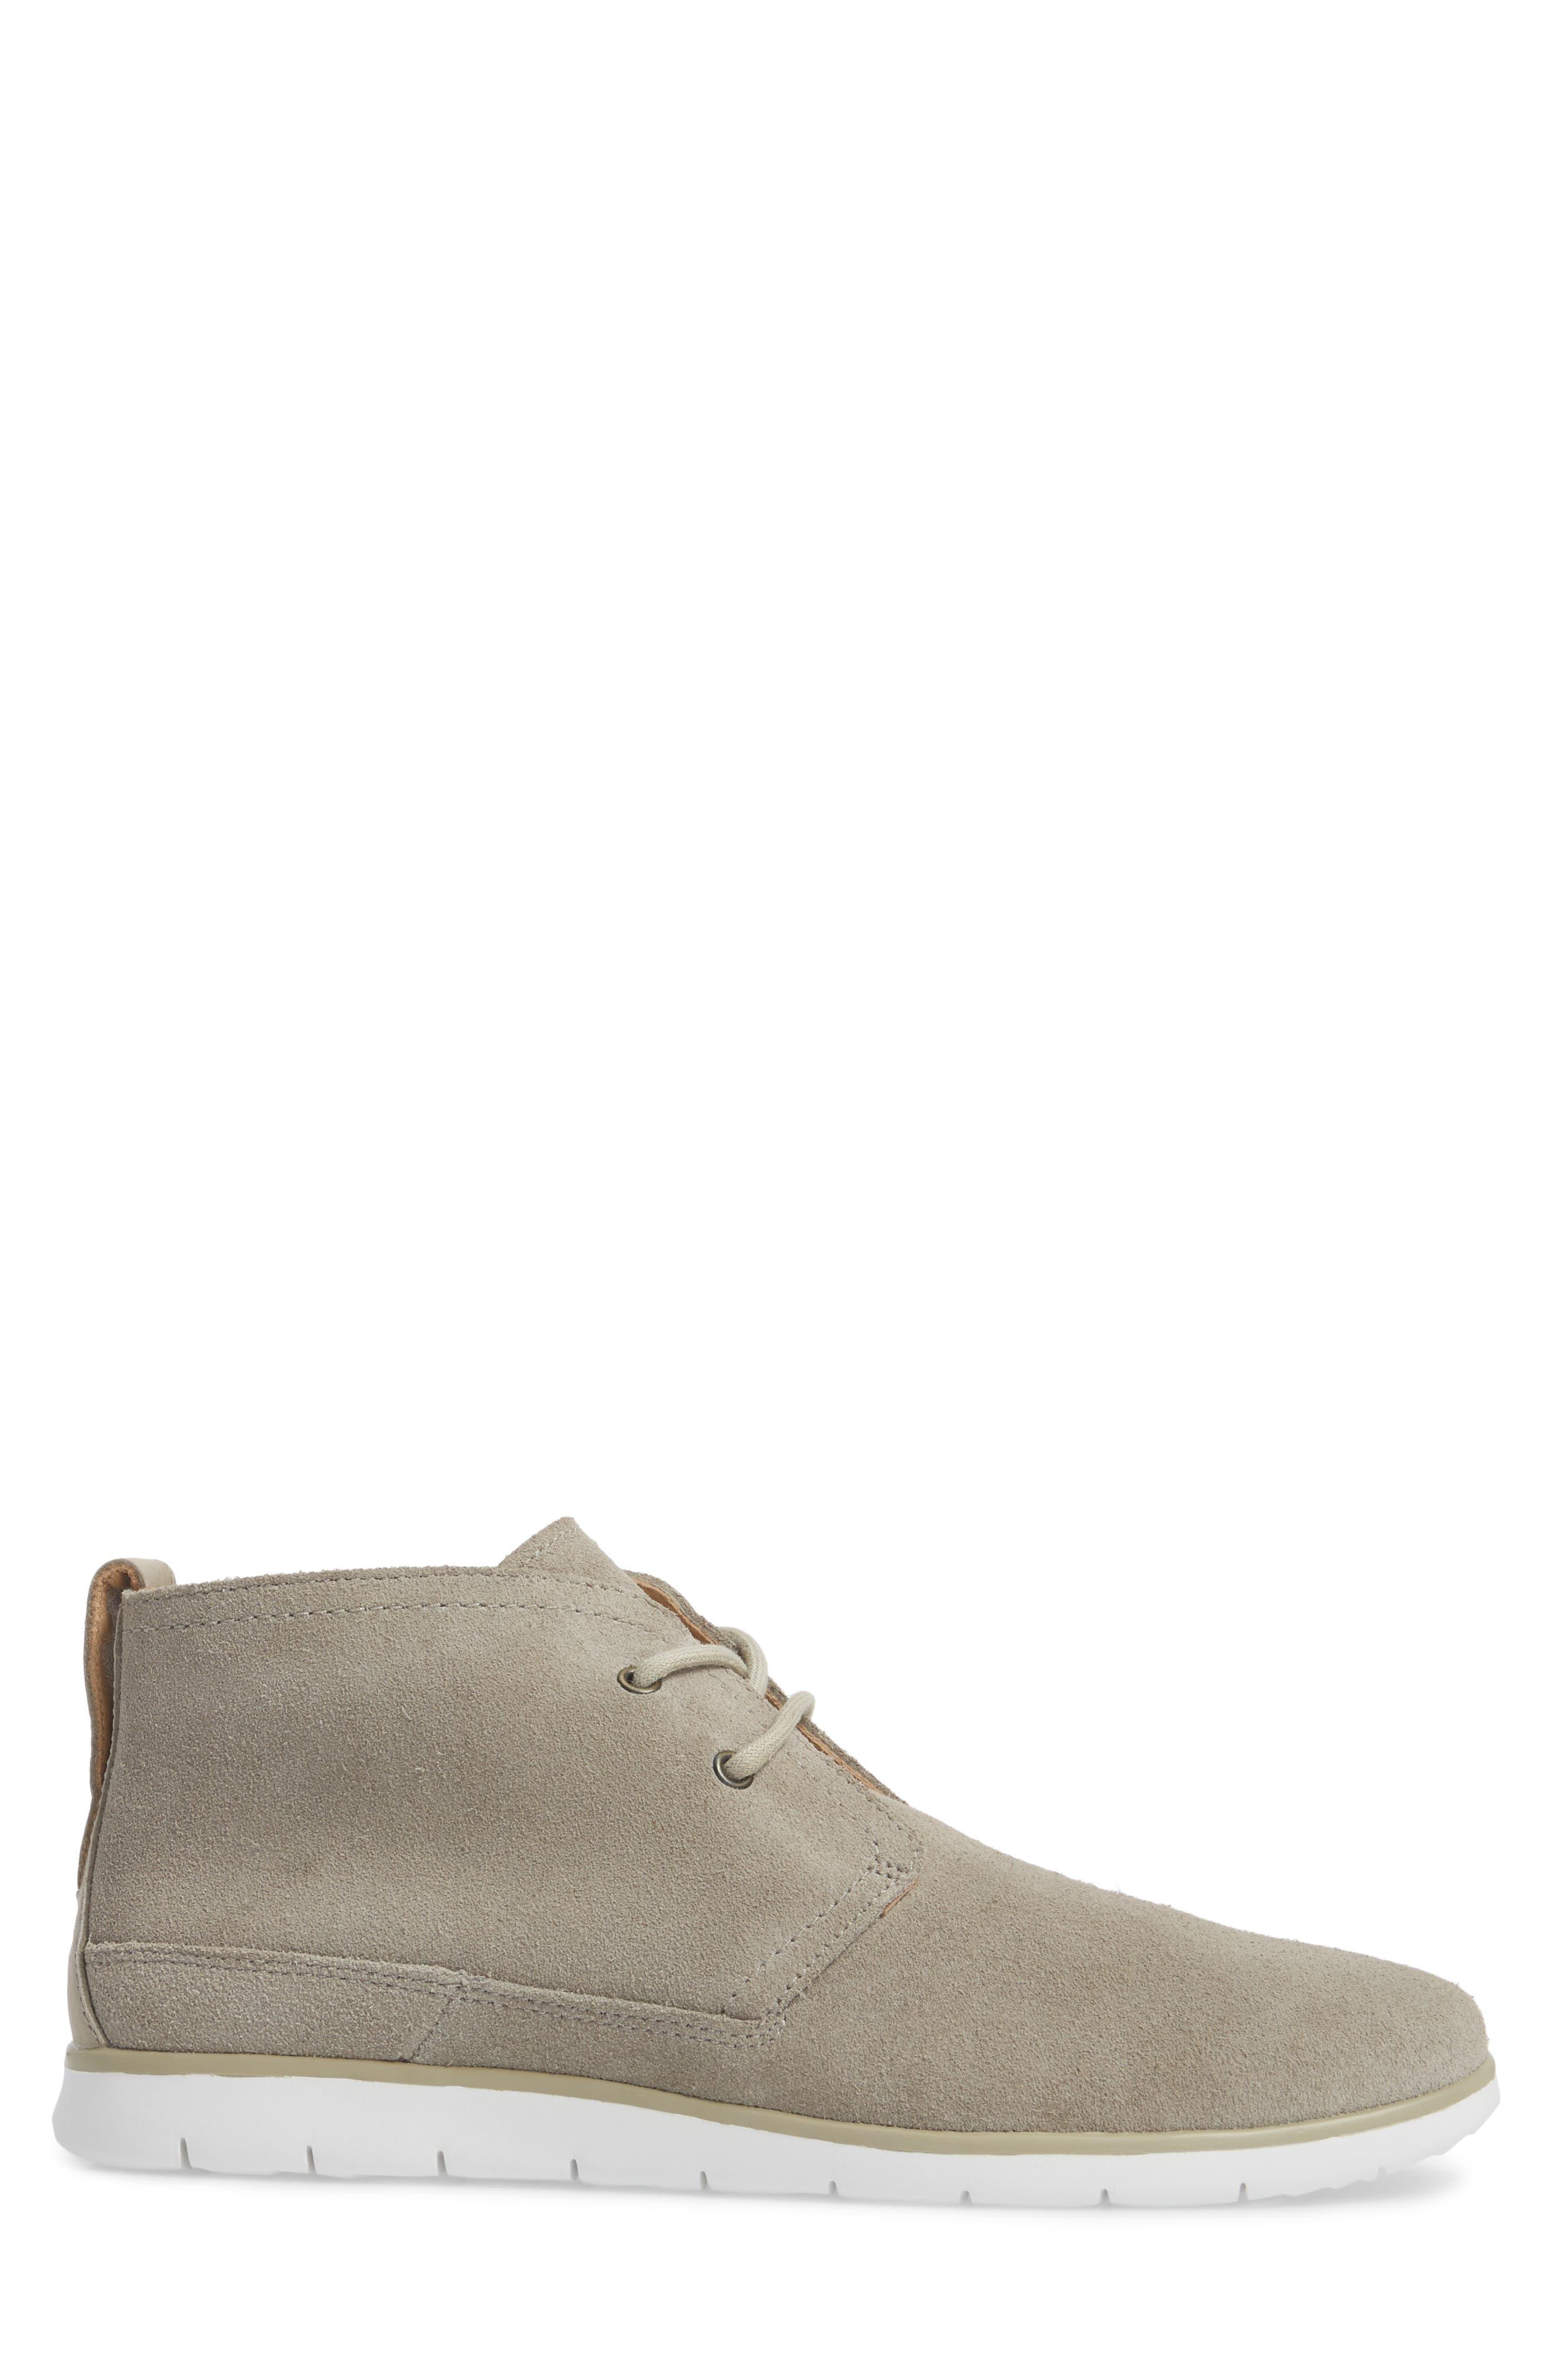 Freamon Chukka Boot,                             Alternate thumbnail 3, color,                             Pumice Leather